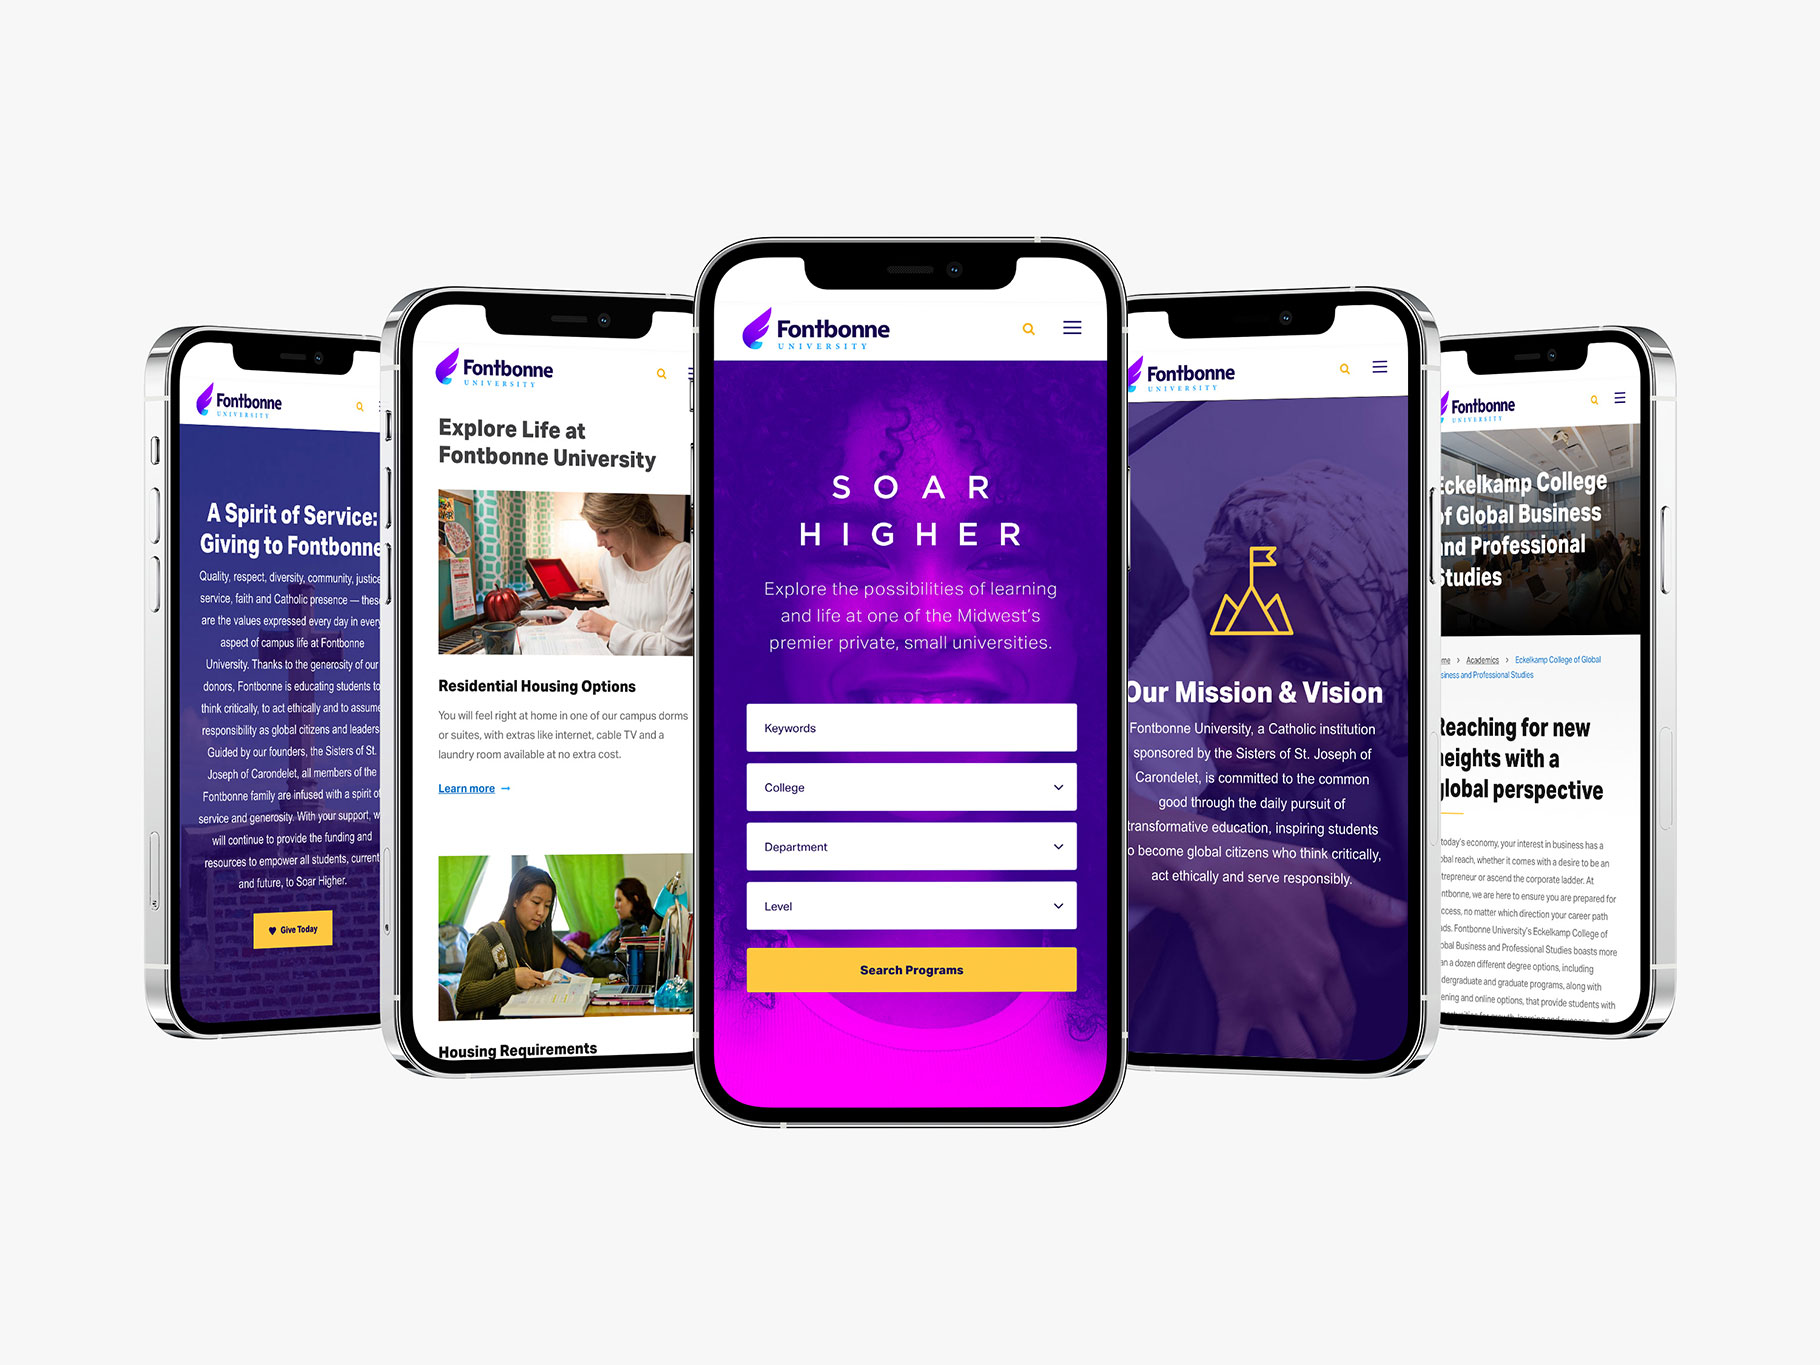 Fontbonne University website page designs on six smartphones